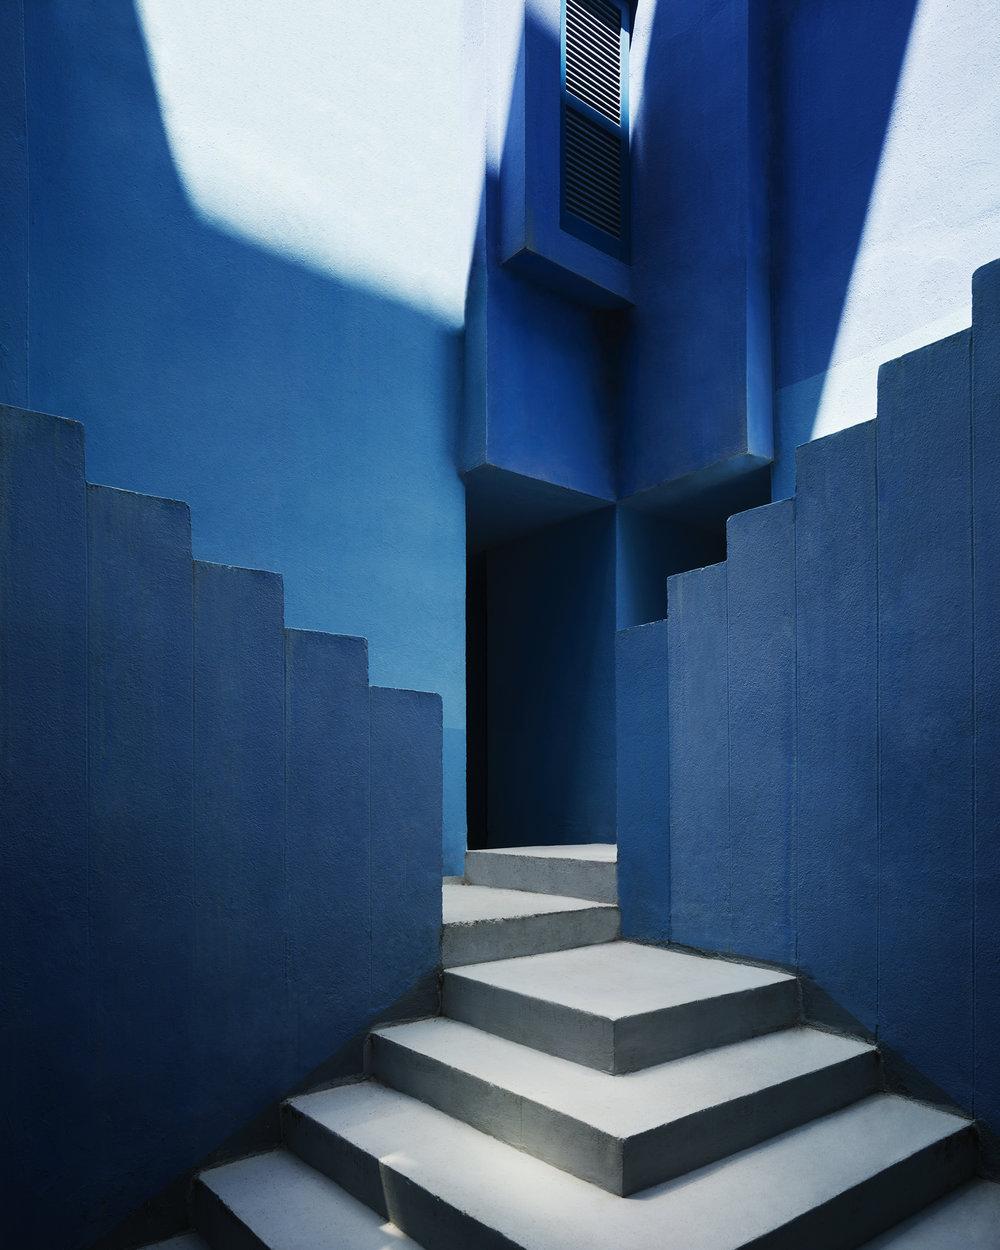 Muralla_Roja_Calpe_Spain_Ricardo_Bofill_Taller_Arquitectura_028.jpg